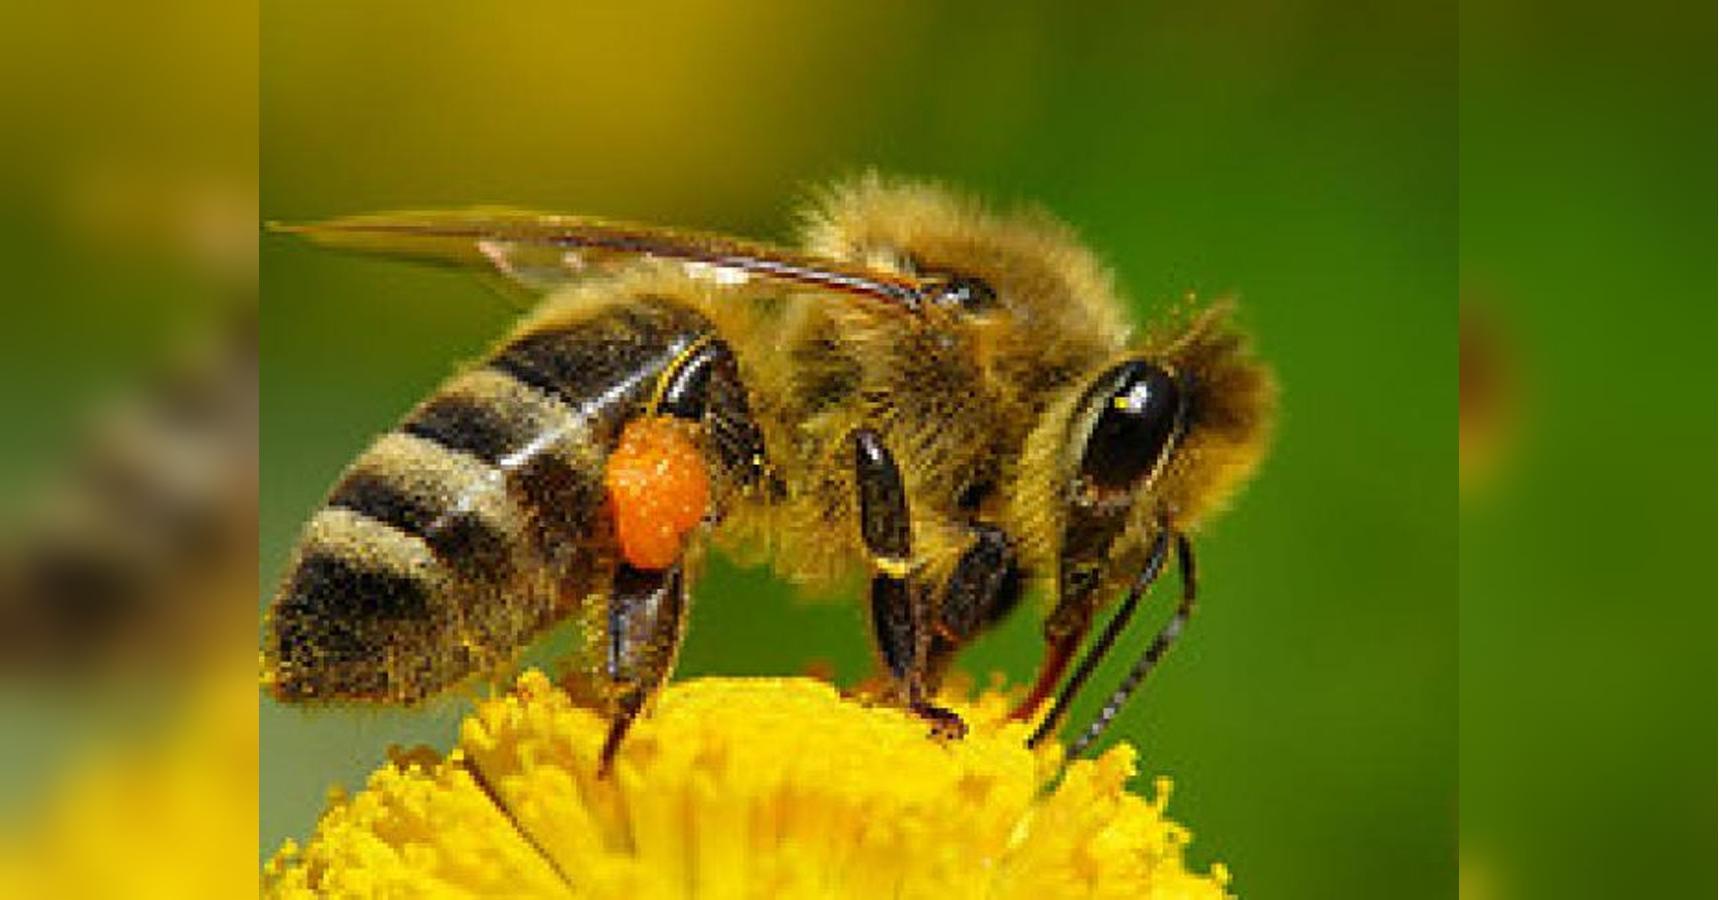 Пчелы фото картинки и описание